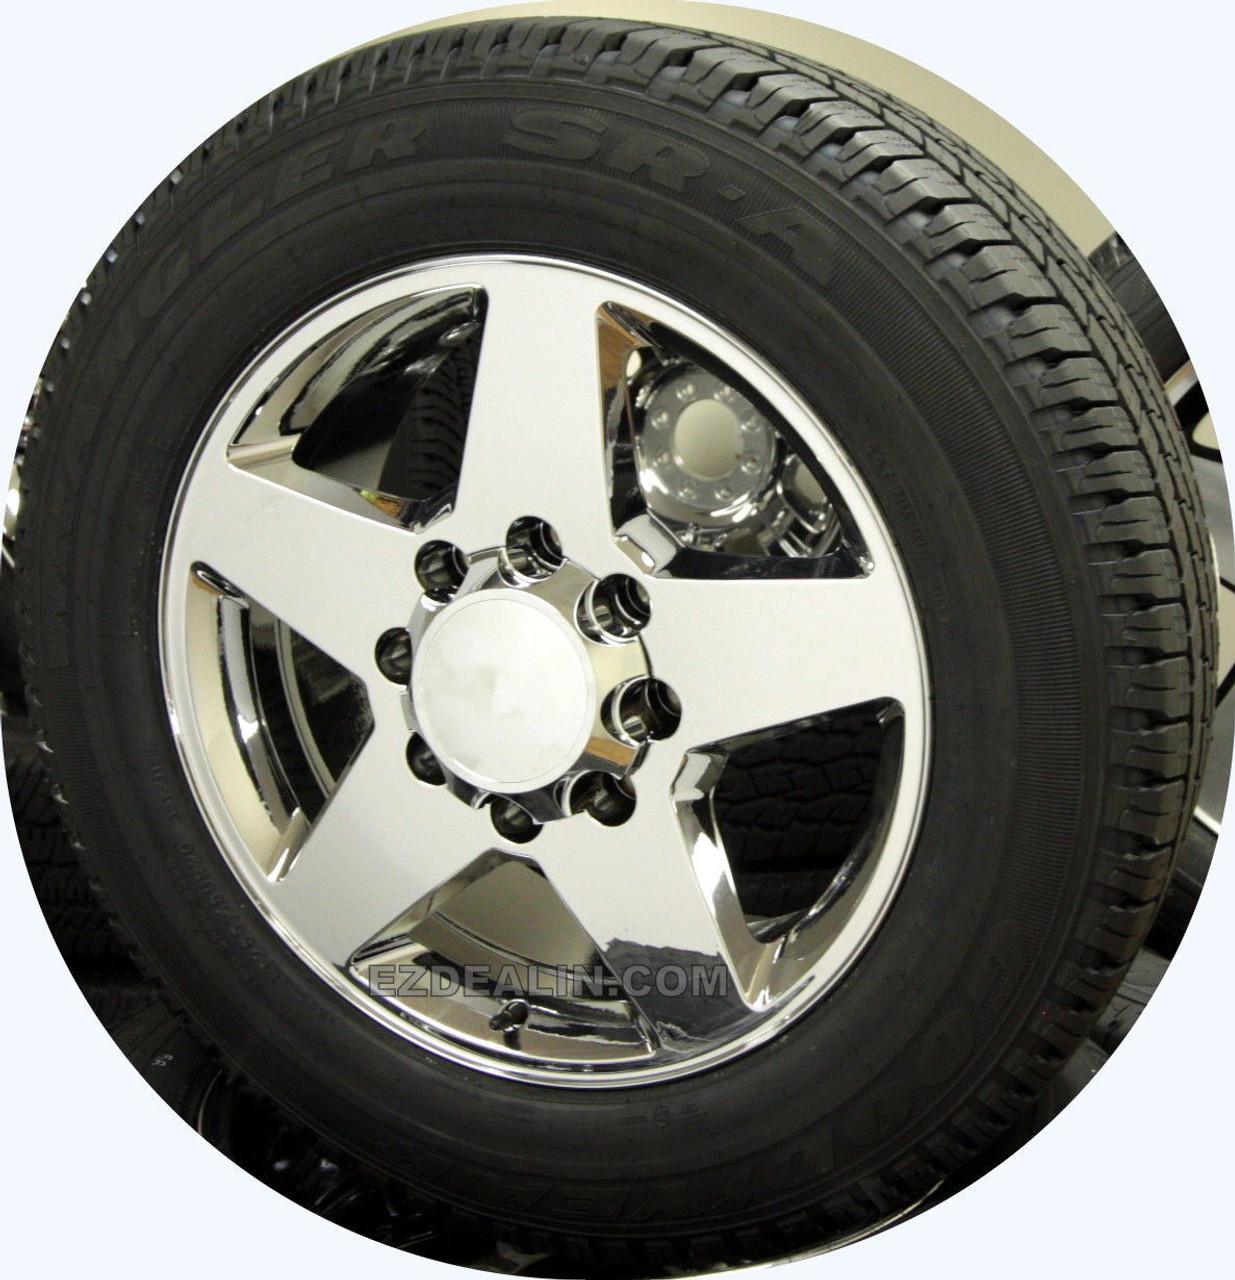 "Chrome 20"" 8 Lug 8-180 Wheels With Goodyear Tires for 2011-2018 GMC Sierra, Denali HD 2500 3500 - New Set of 4"